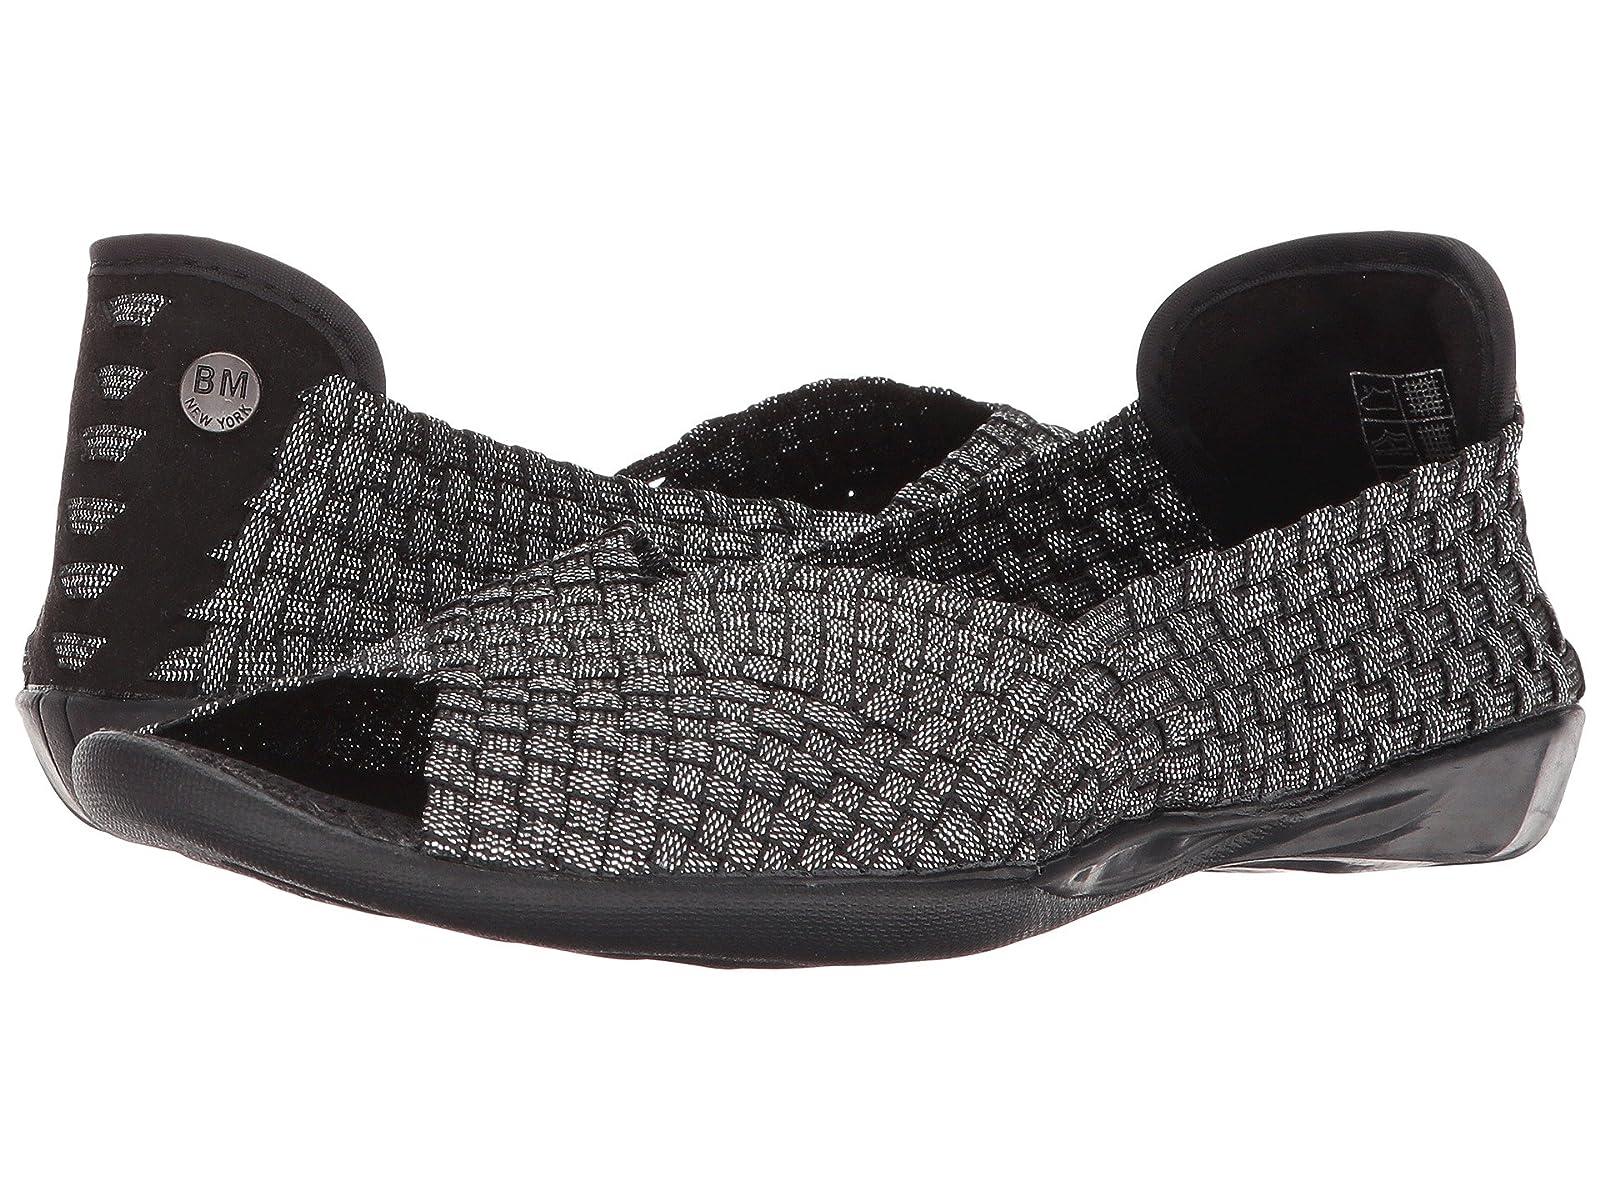 bernie mev. DreamAtmospheric grades have affordable shoes